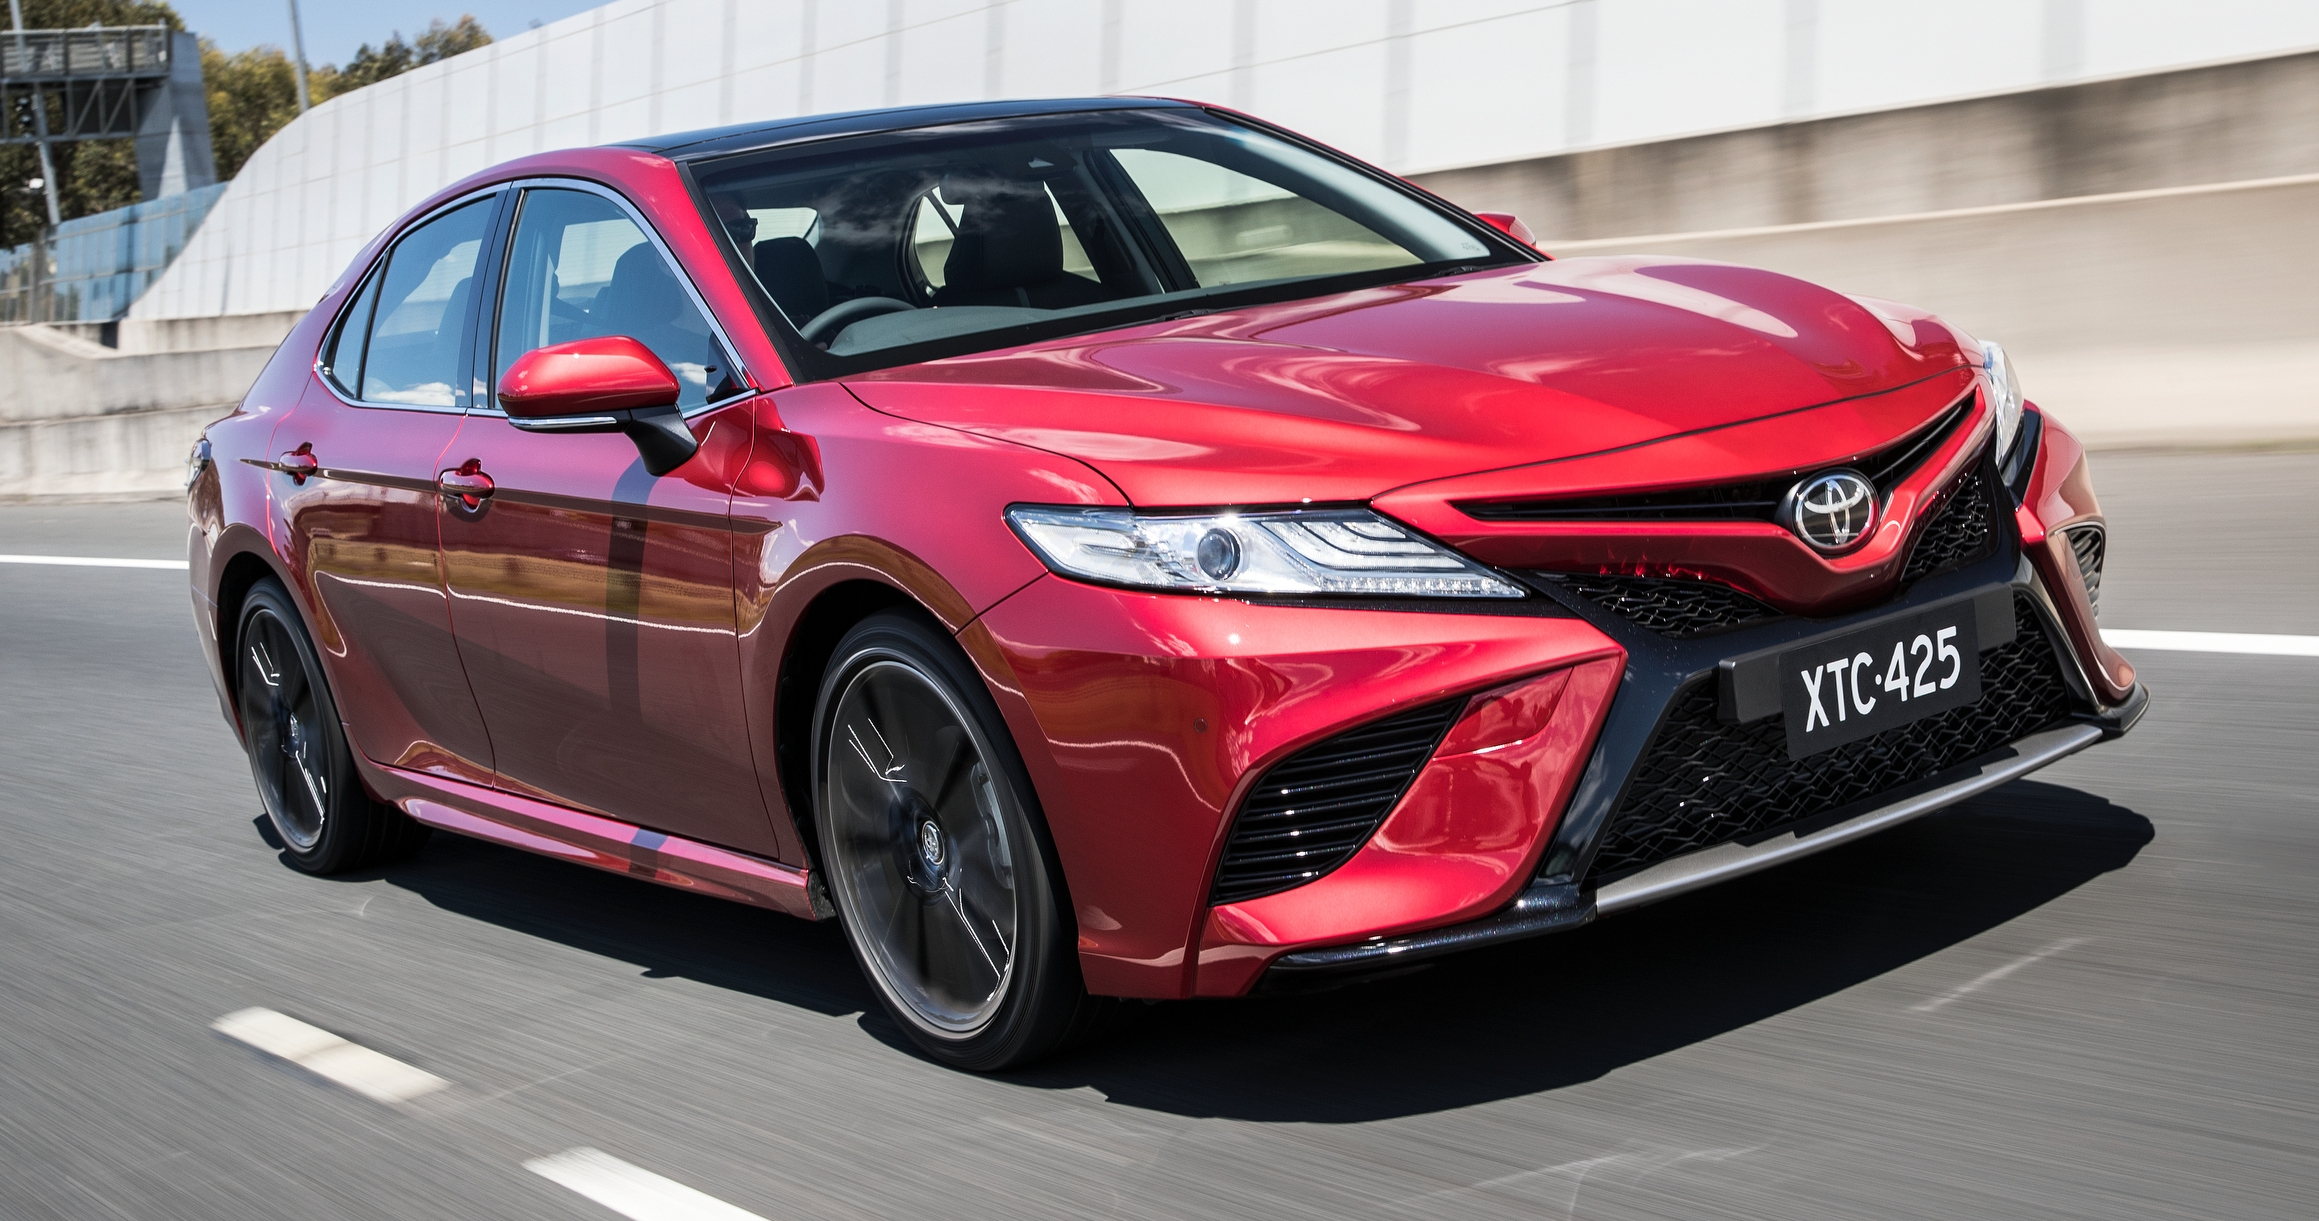 Kelebihan Harga Toyota Camry Tangguh